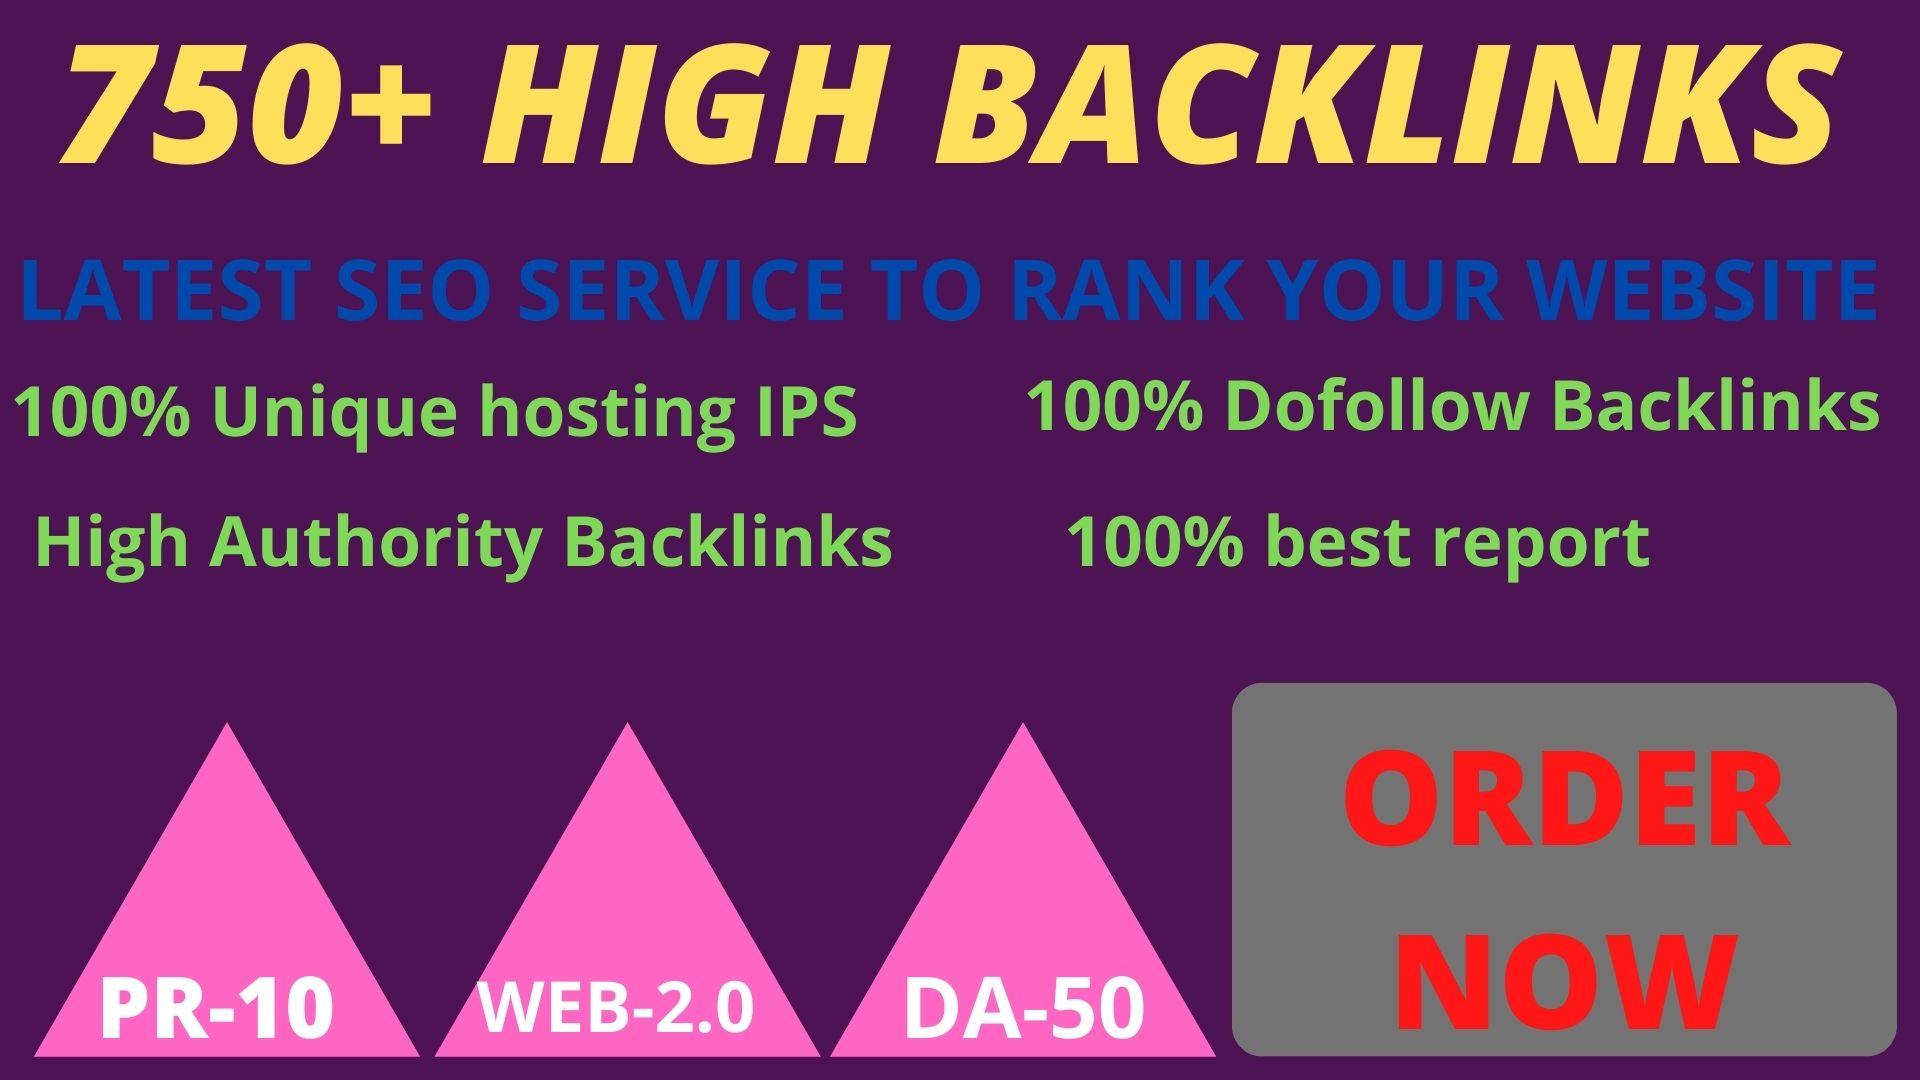 Get 750 Web 2.0 PBN Dofollow High Backlinks improve your website ranking